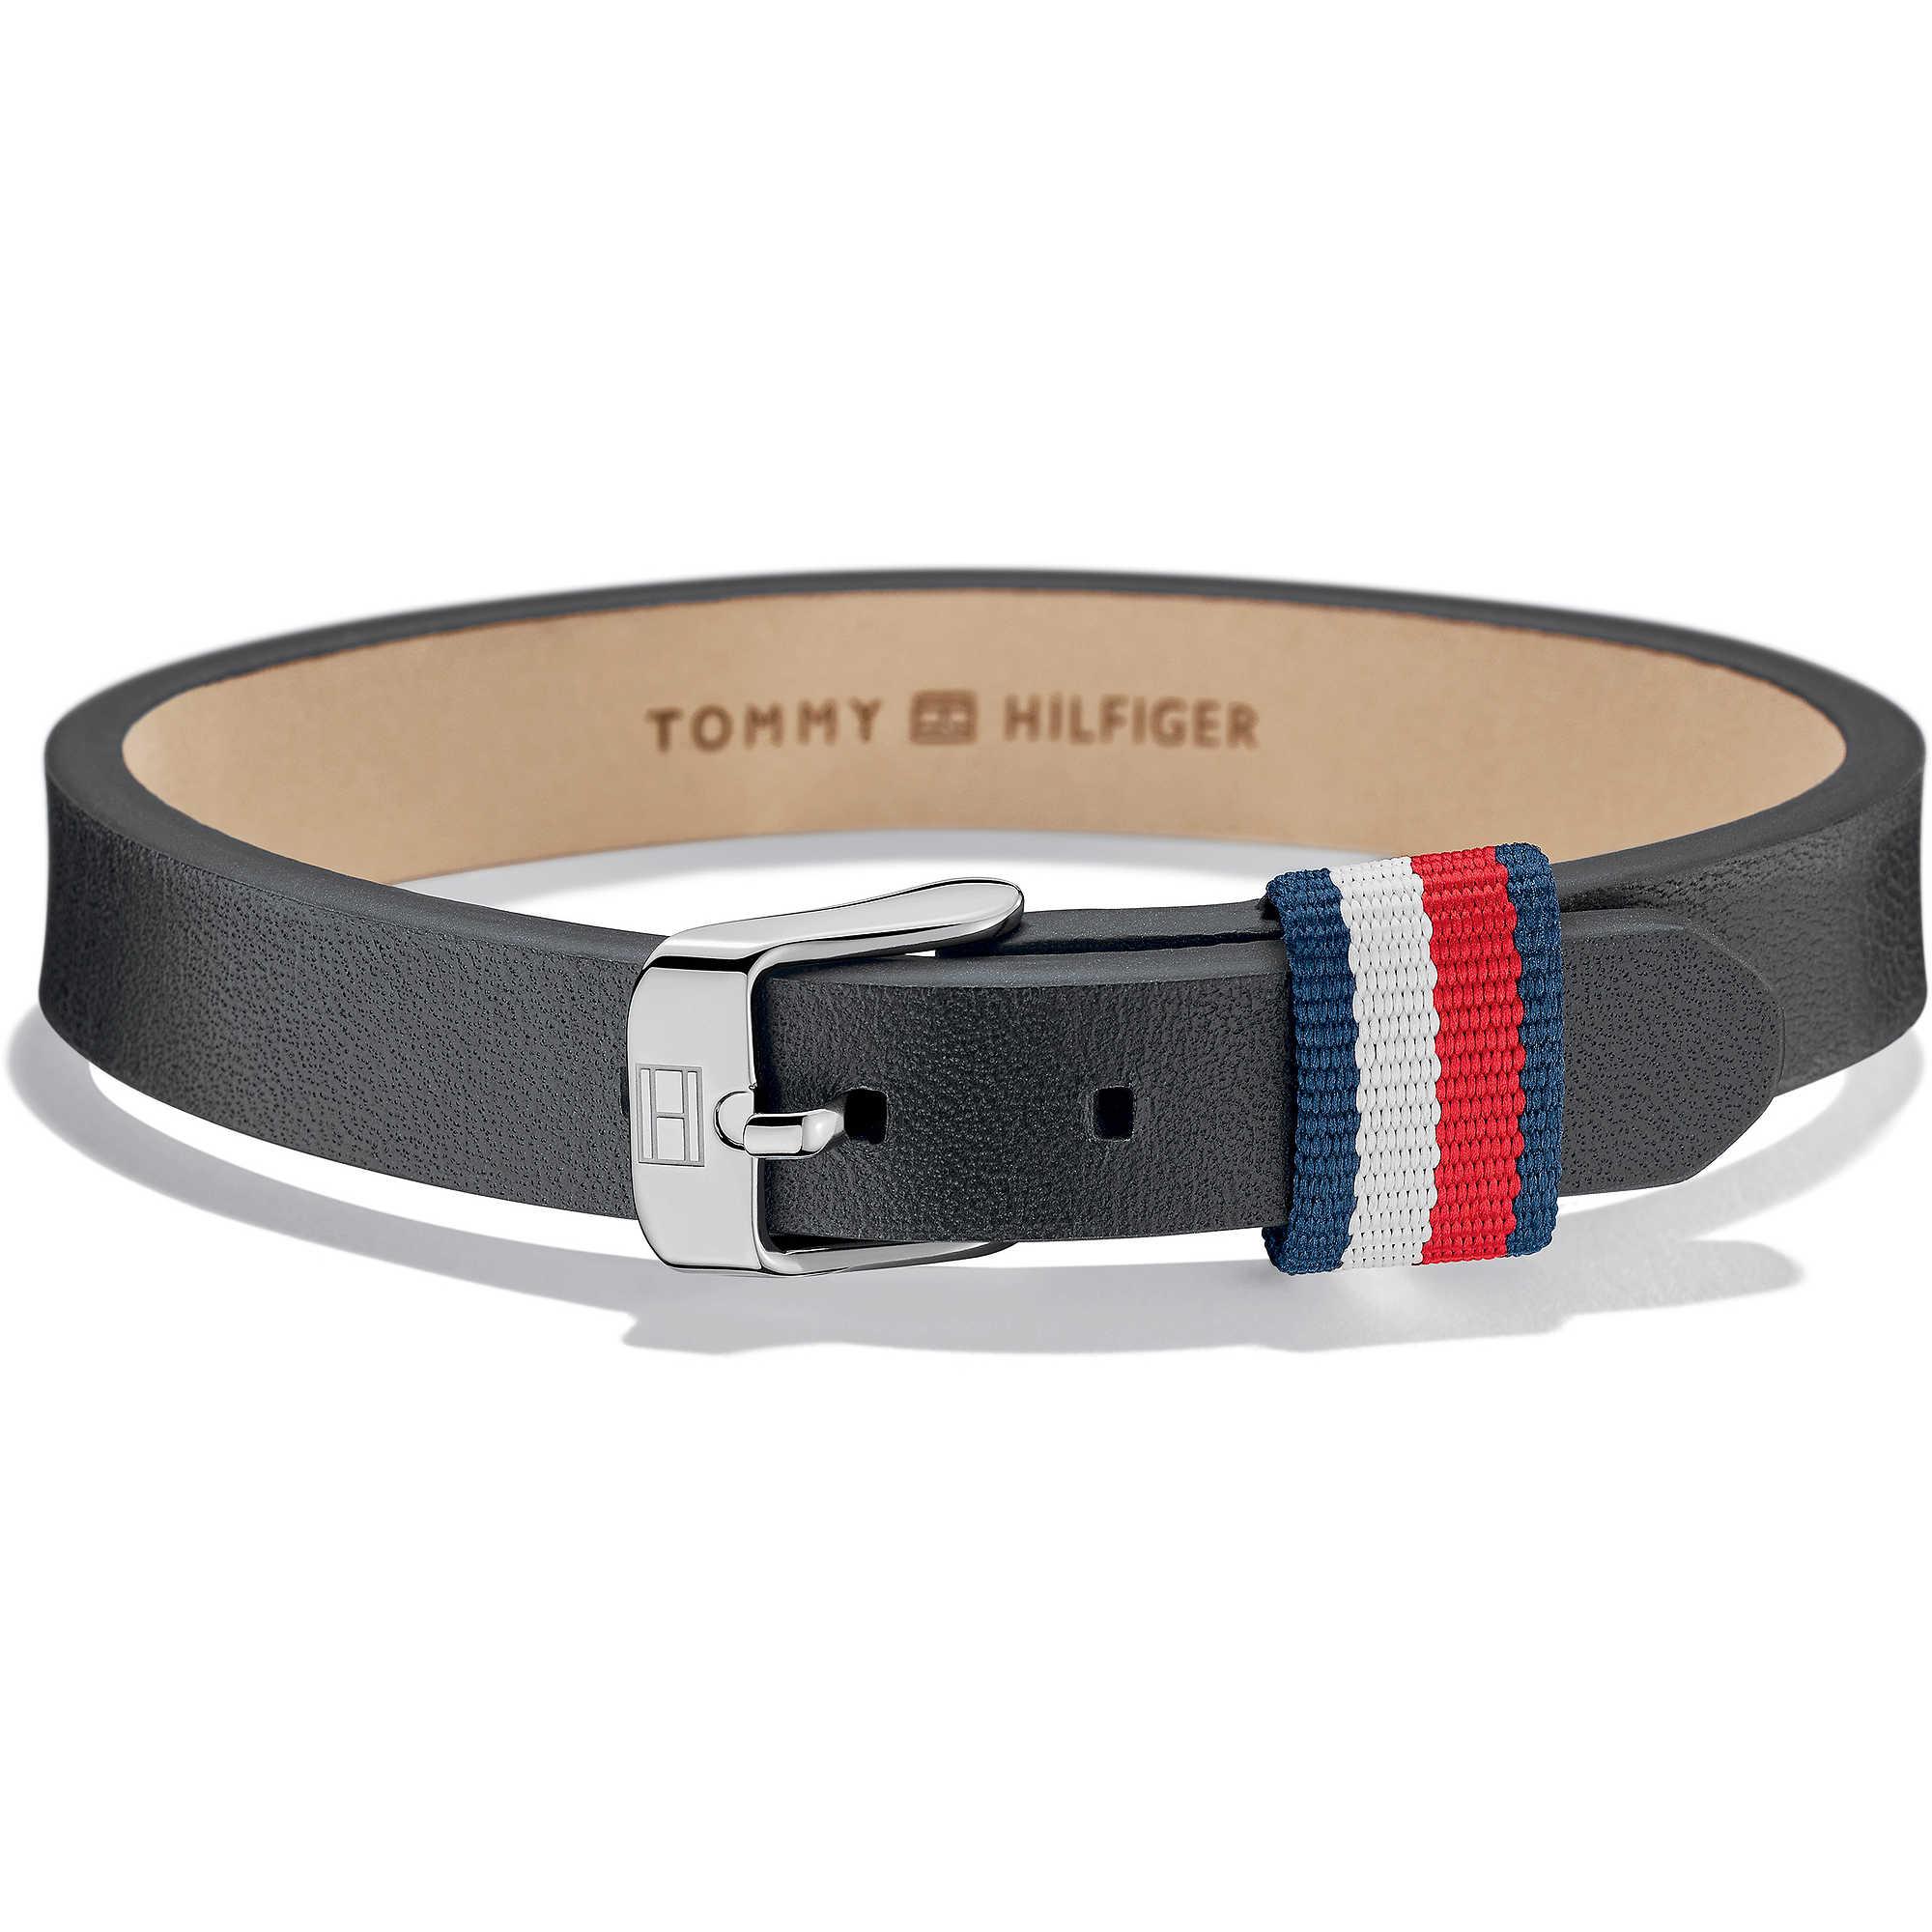 bracelet man jewellery tommy hilfiger mini belt thj2700956 bracelets tommy hilfiger. Black Bedroom Furniture Sets. Home Design Ideas